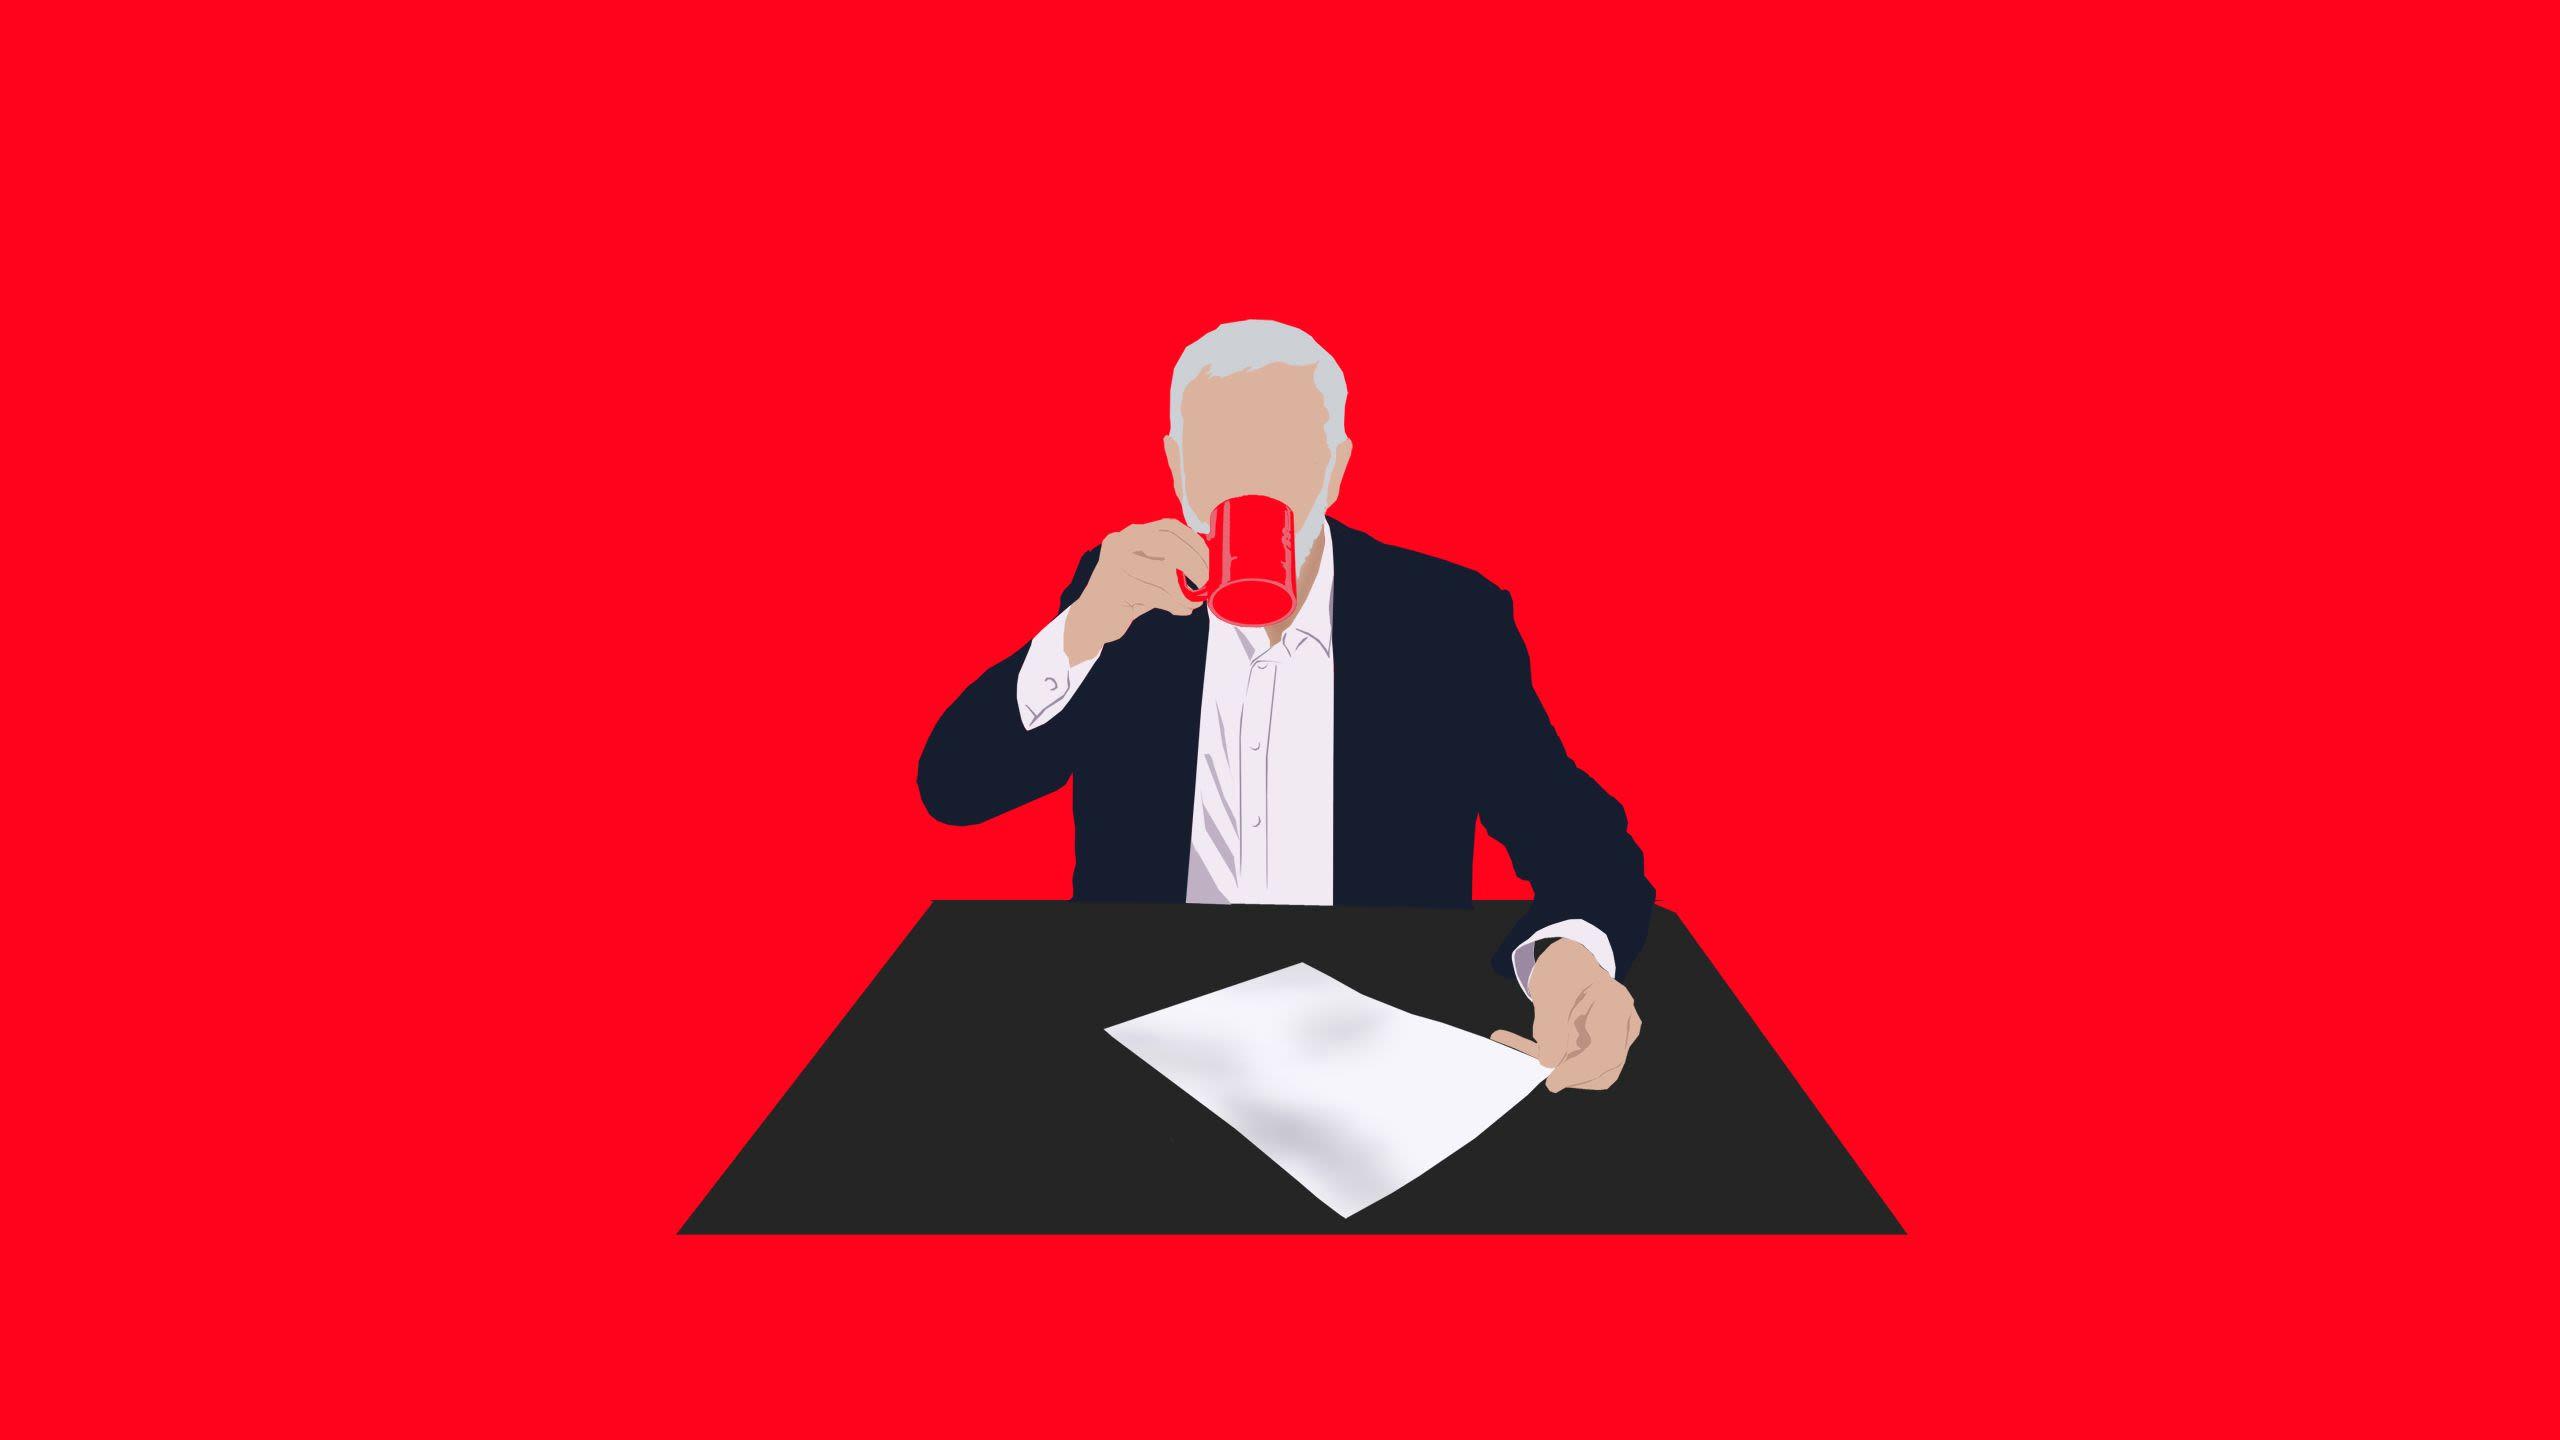 Illustration of Jeremy Corbyn drinking tea